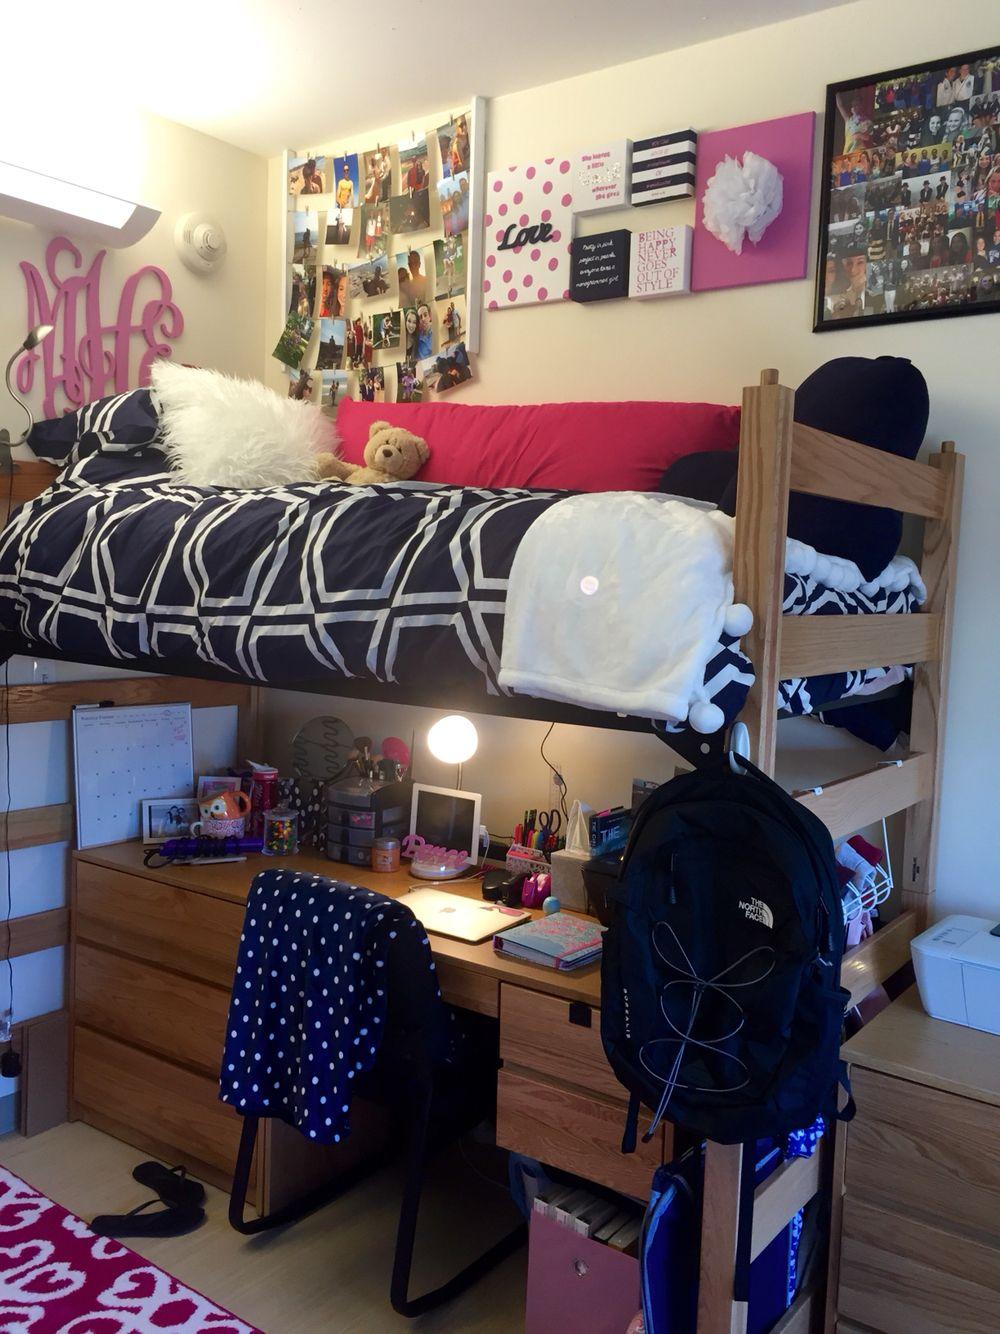 Uri Hillside Hall College Life Dorm Dorm Room